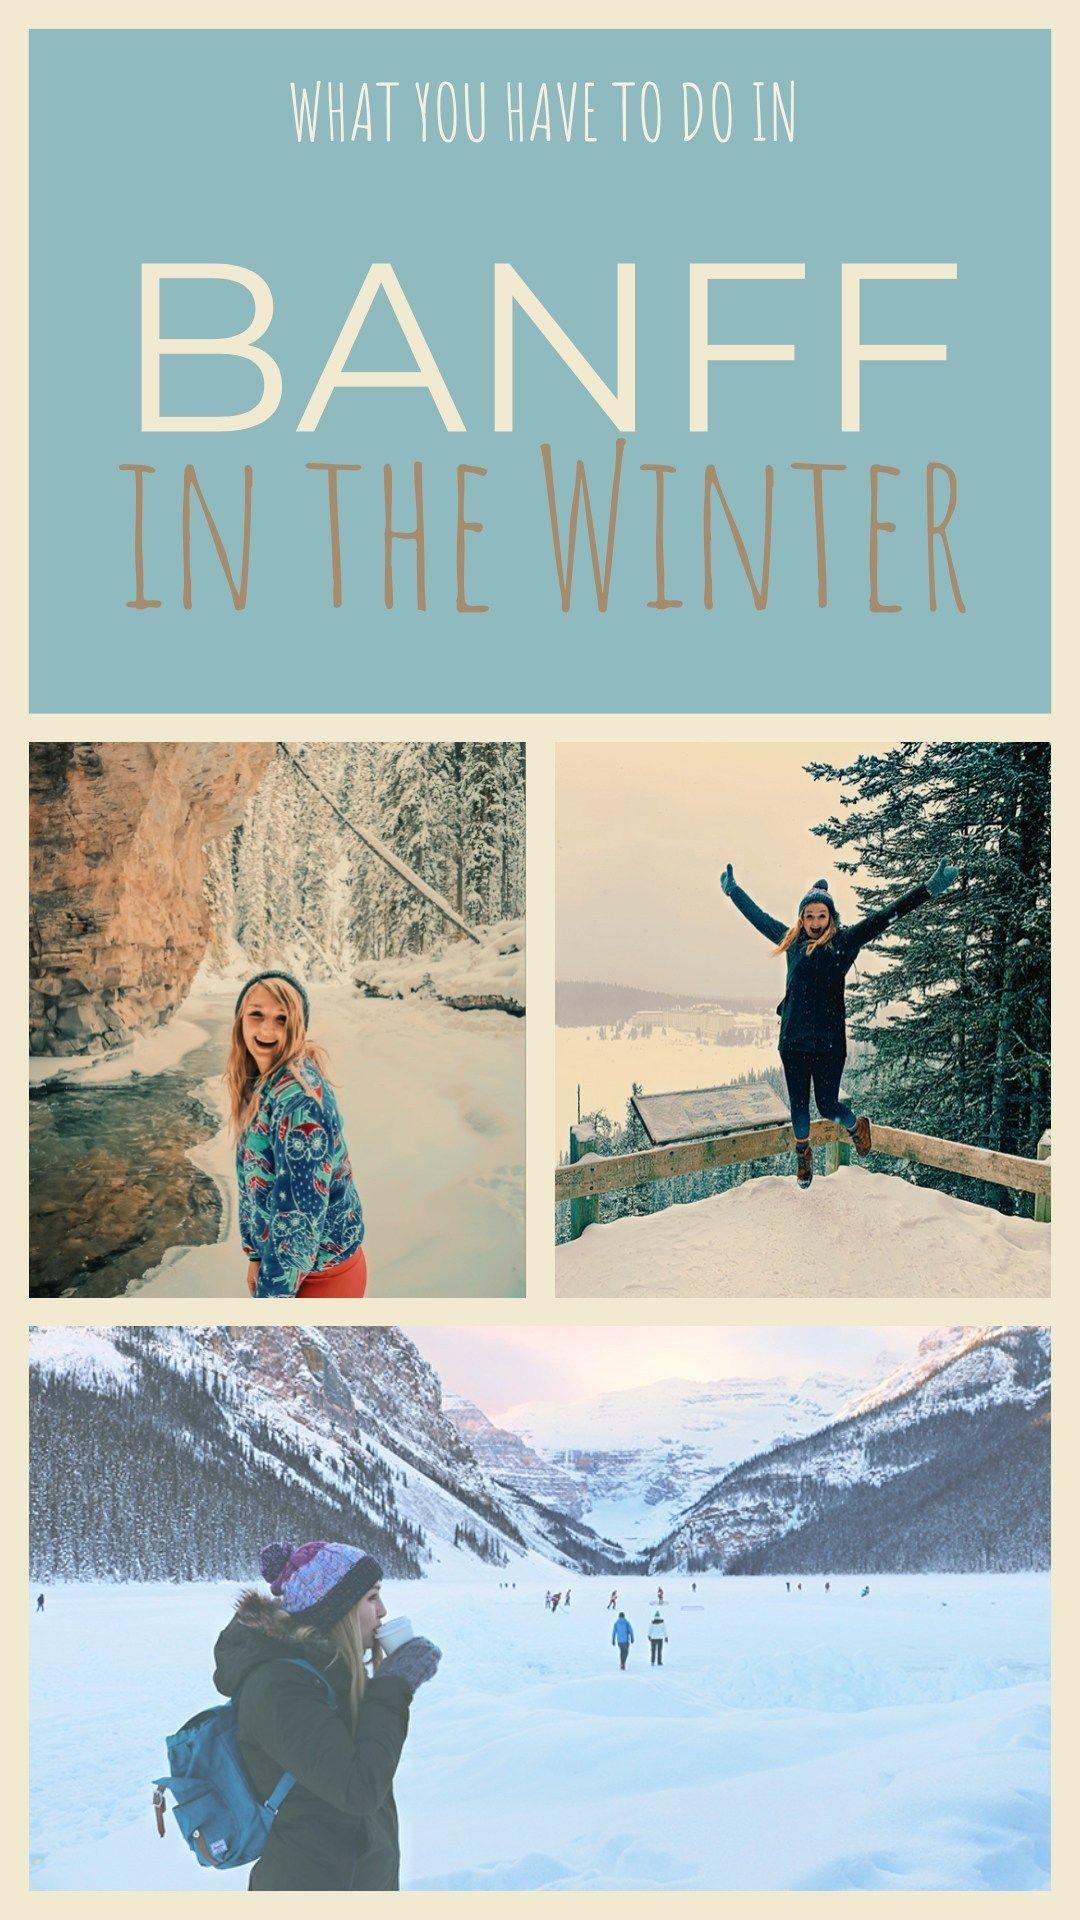 Banff In The Winter Winter Adventure Bucket List Items Banff Activities Banff Lake Louise Ski Resort